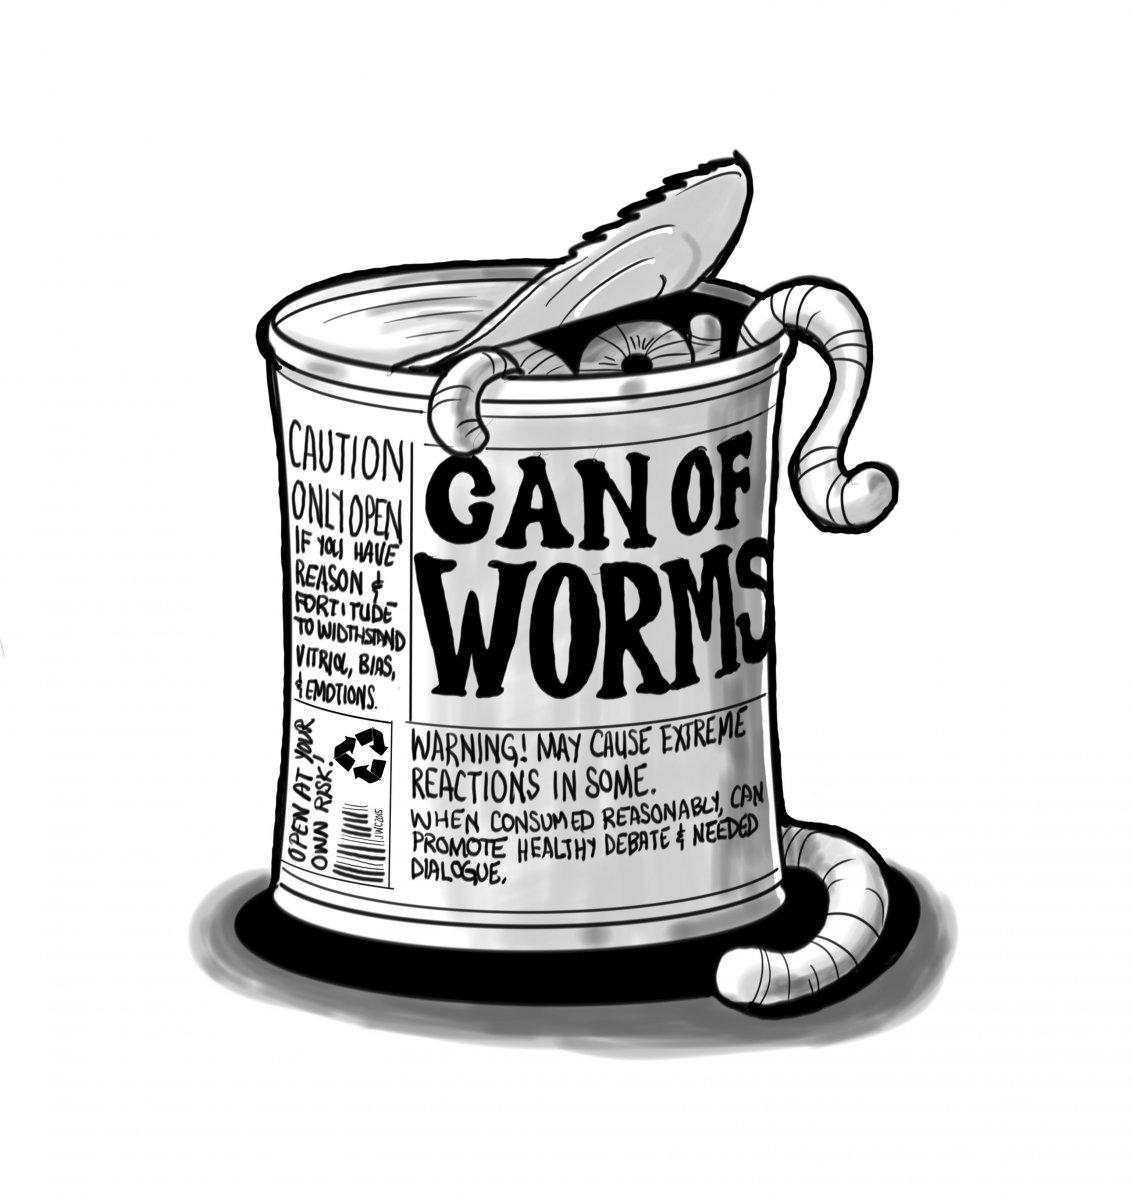 Can-of-Worms-by-Jason-Crislip-jpeg1.jpg